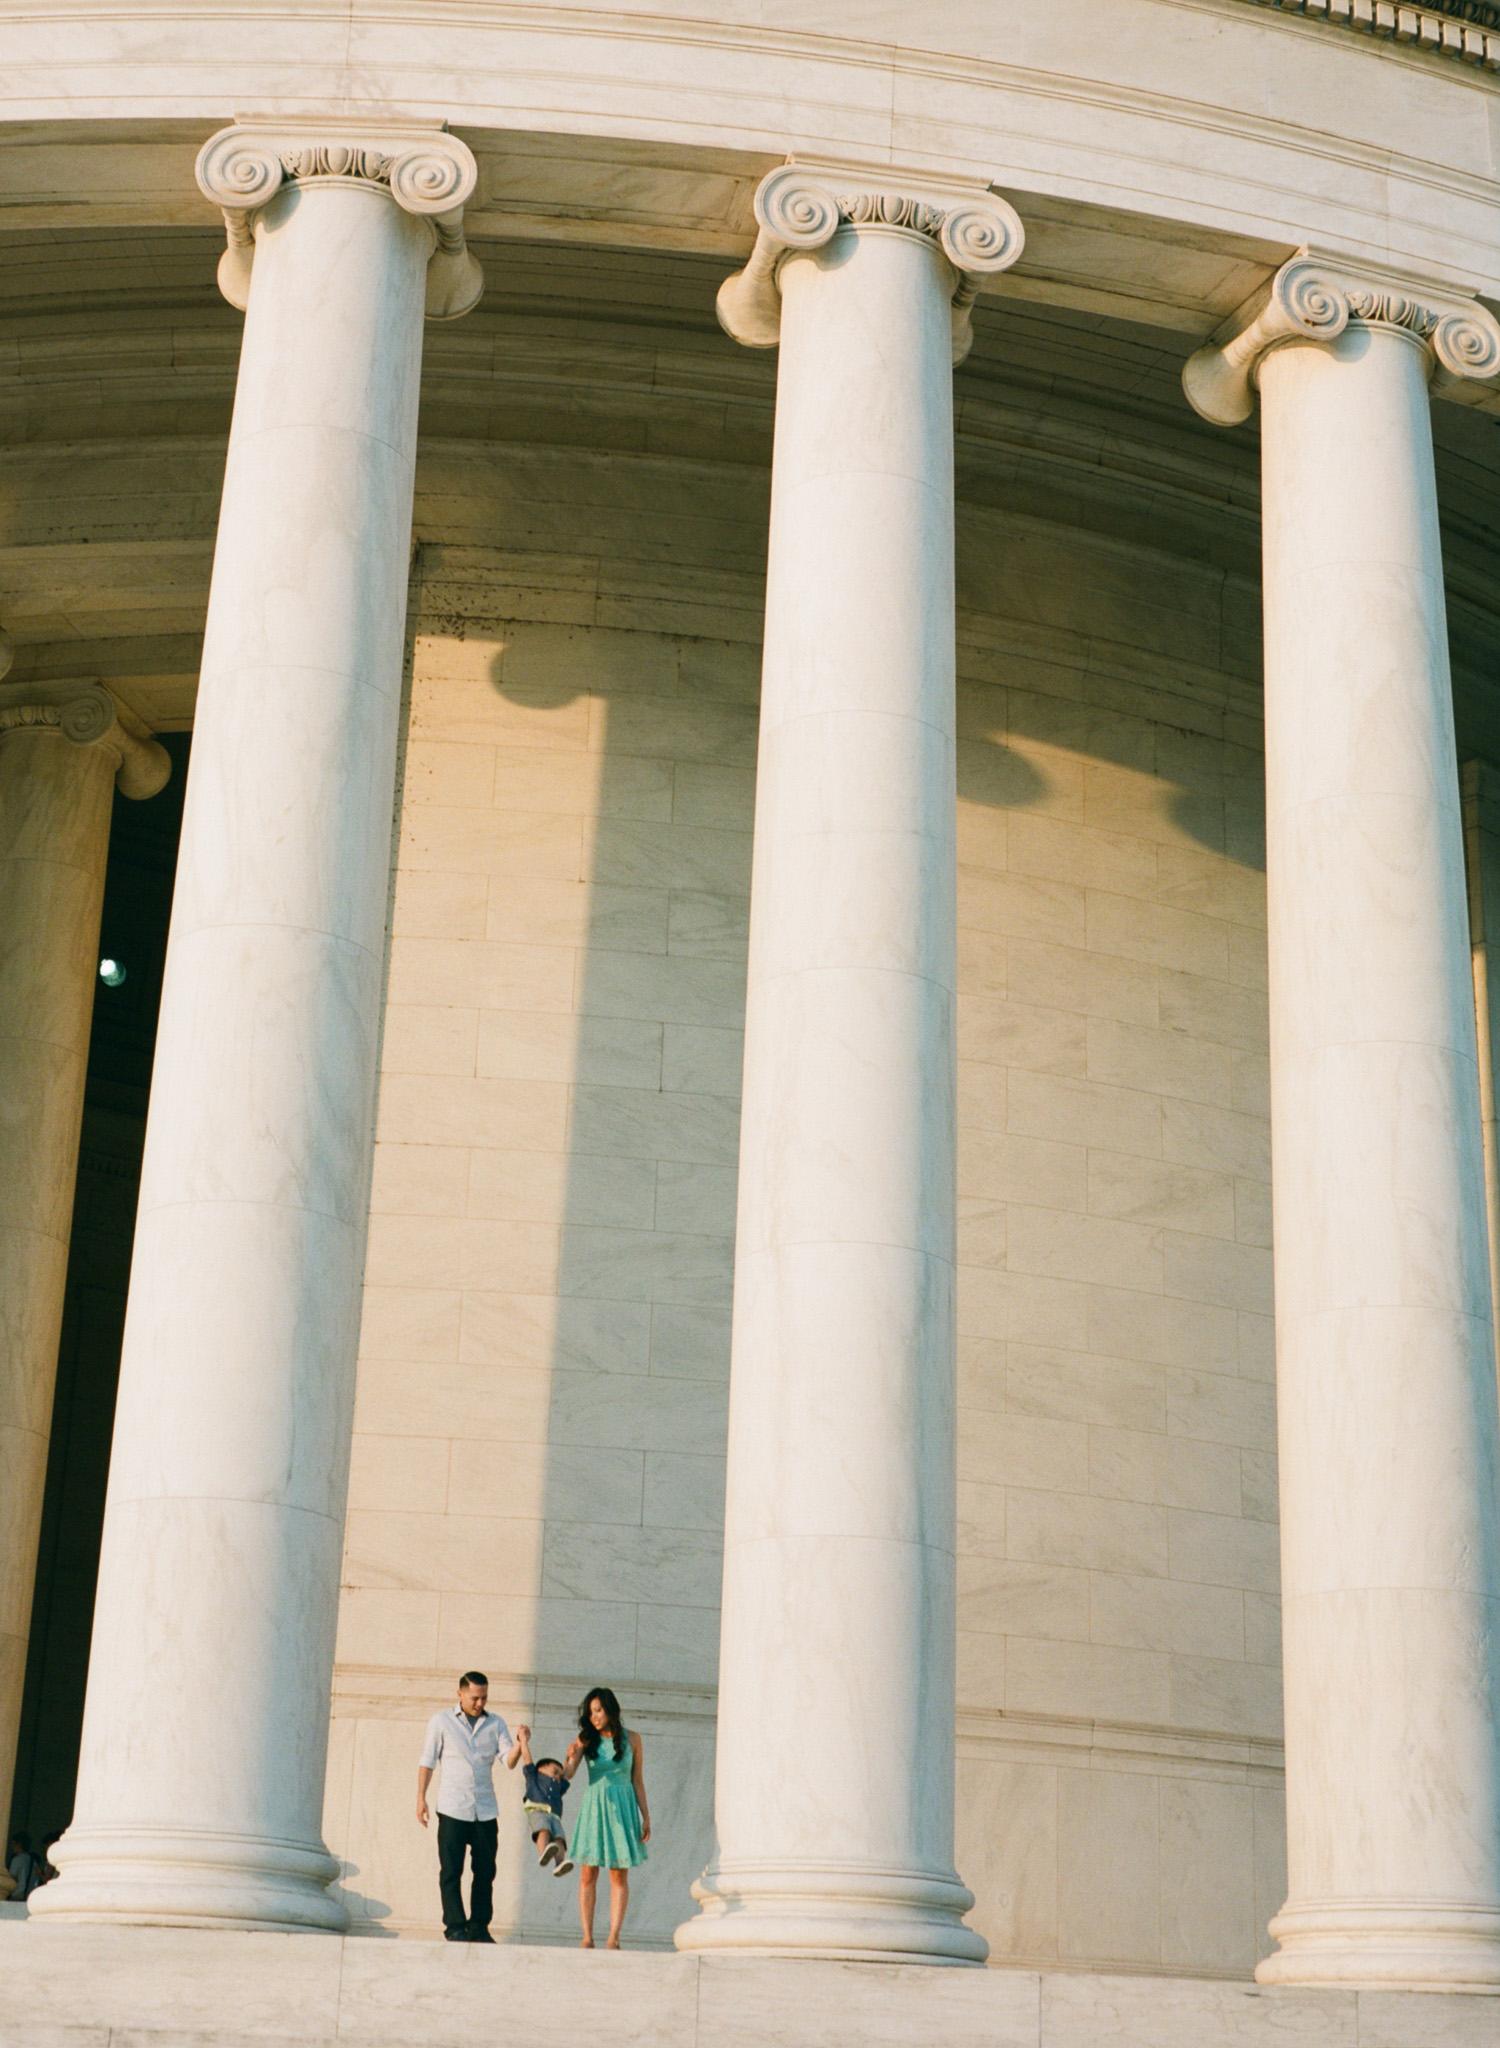 Jefferson-Memorial-Portrait-Photographer-24.jpg